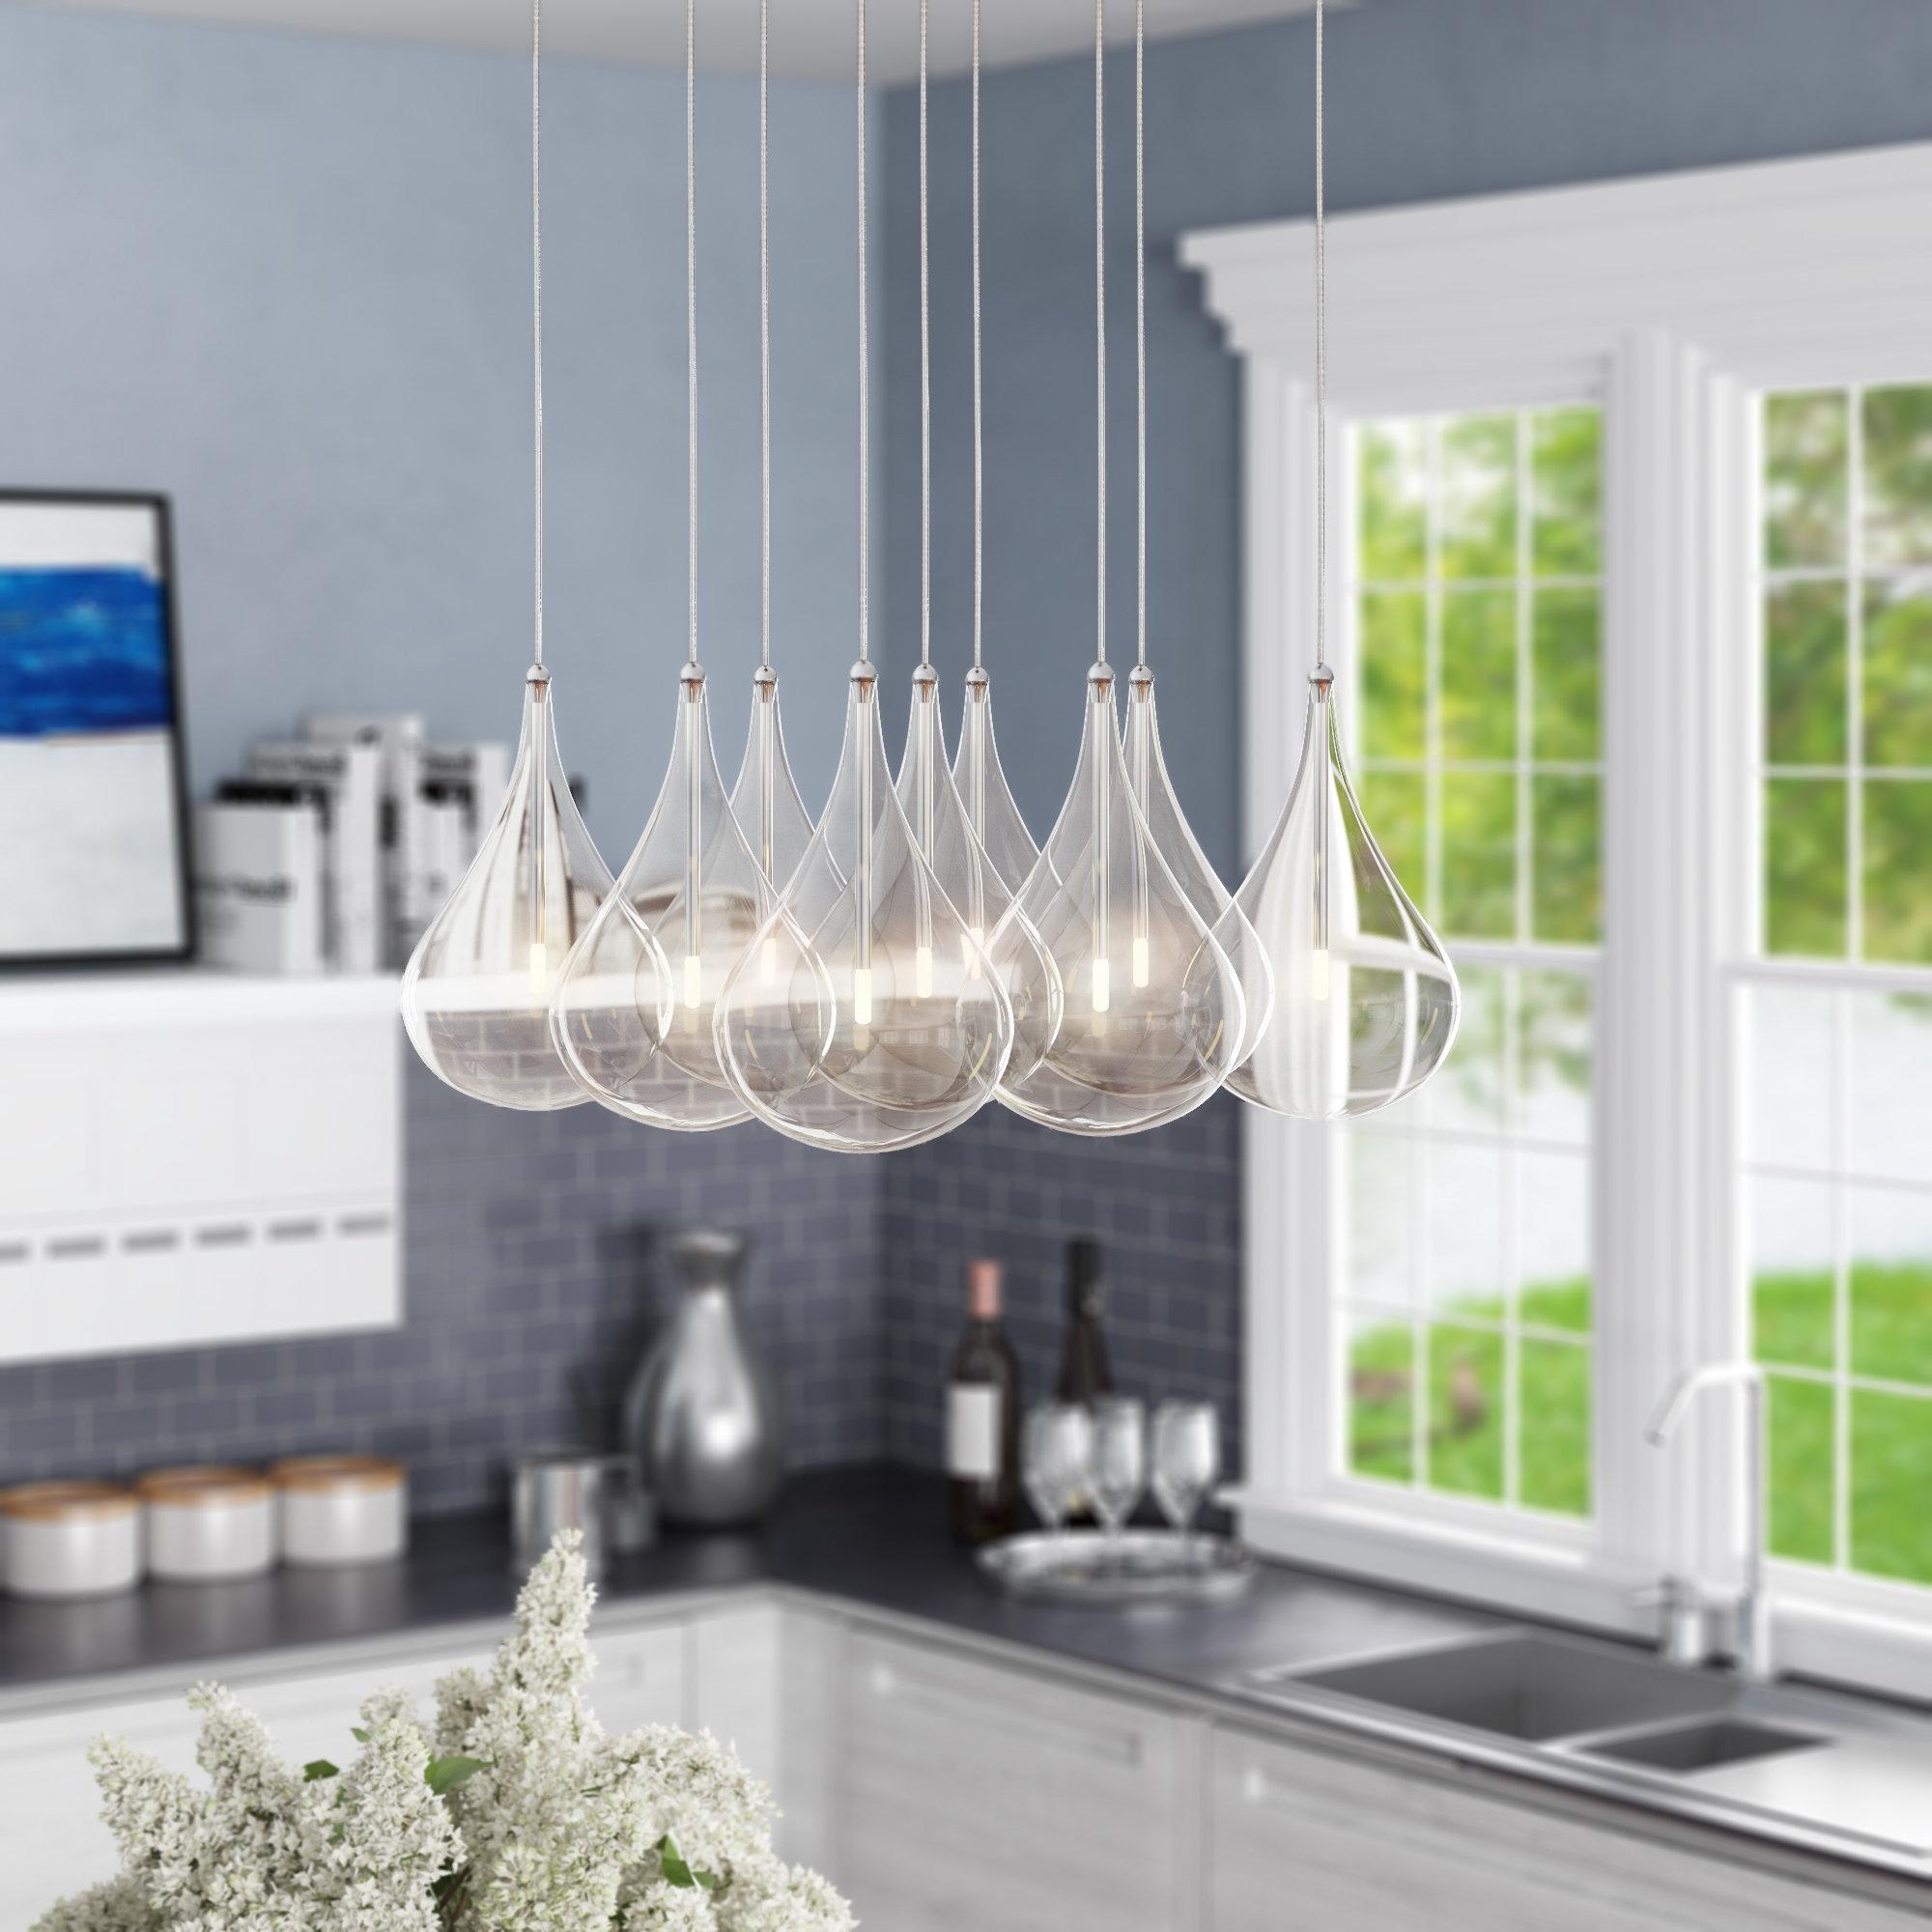 Popular Neal 9 Light Kitchen Island Teardrop Pendants In Neal 9 Light Kitchen Island Pendant (View 2 of 20)